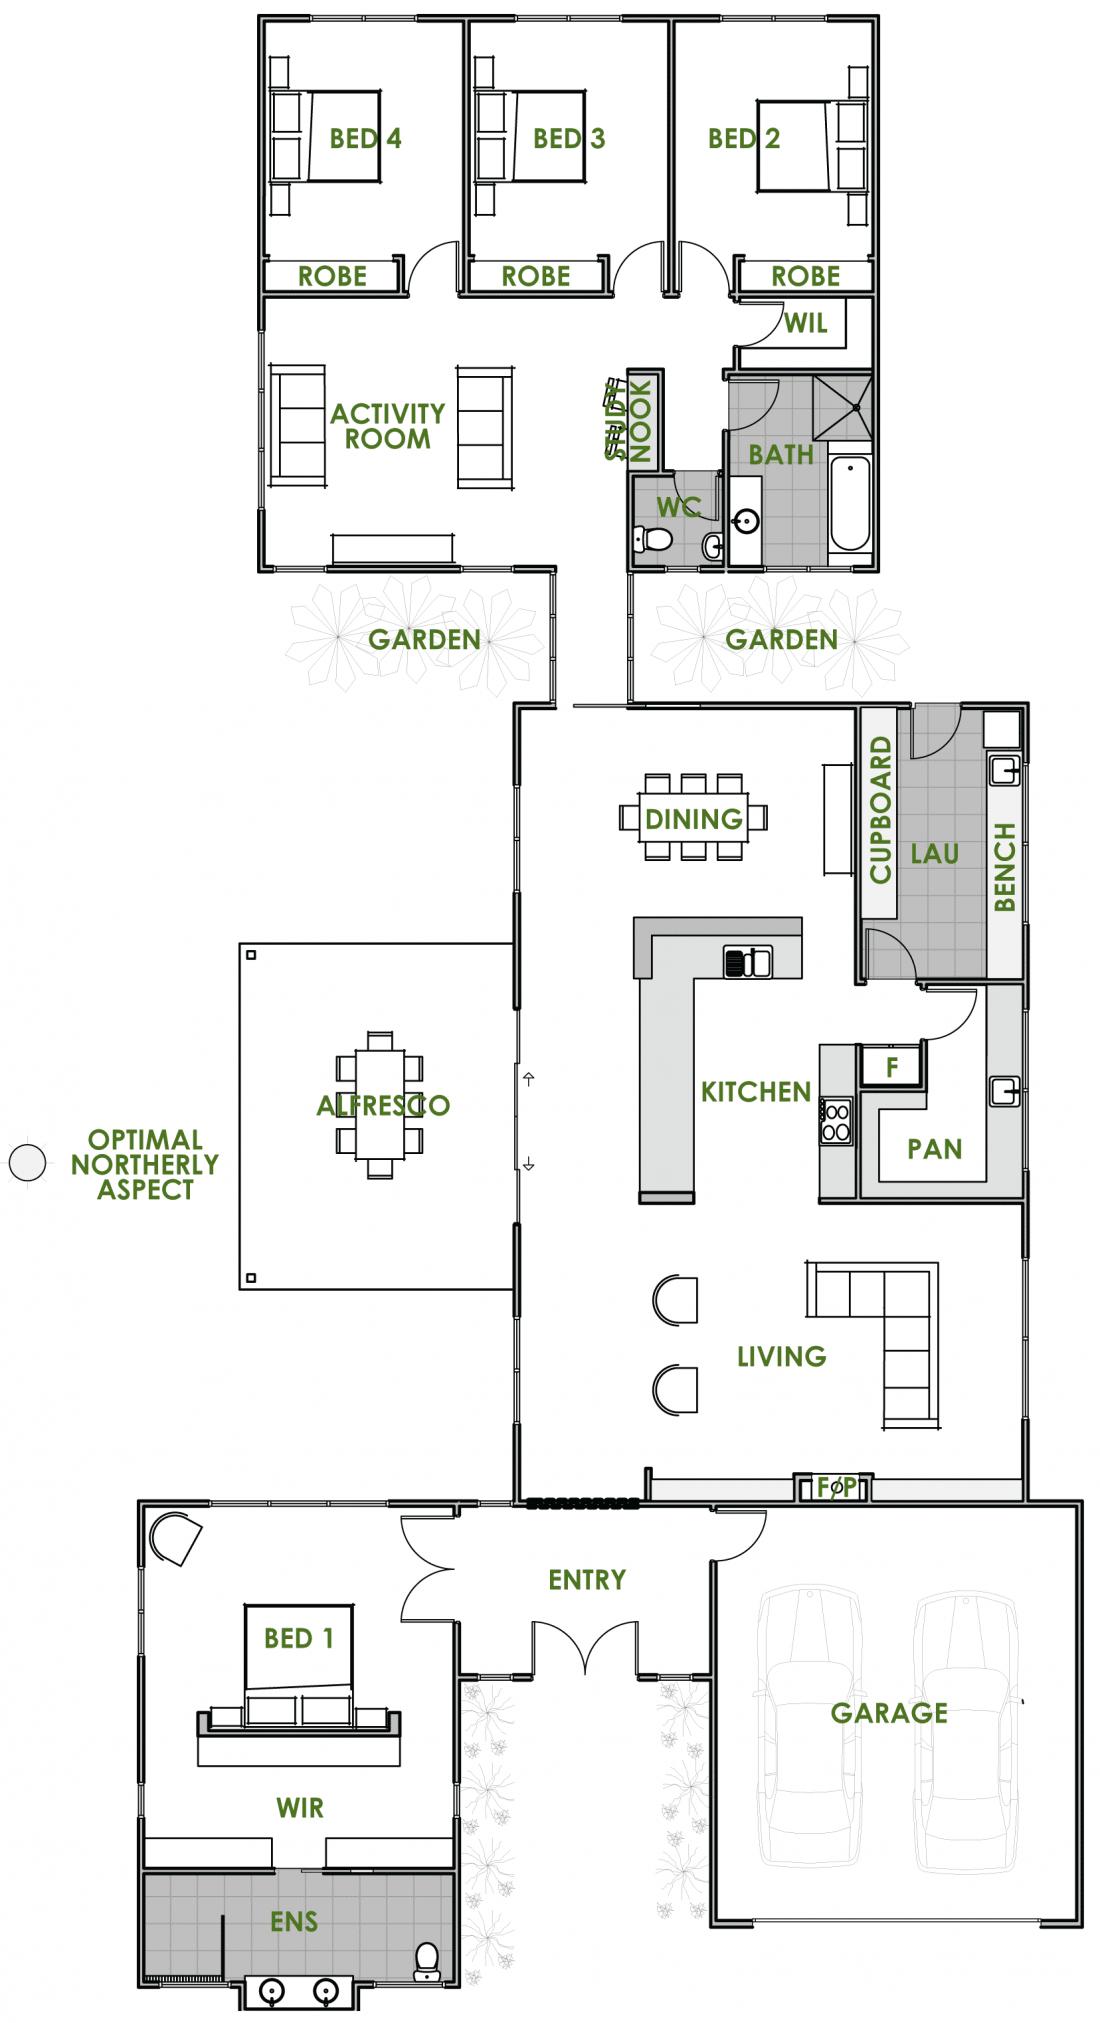 Floor Plan Friday: An energy efficient home | House plans ...